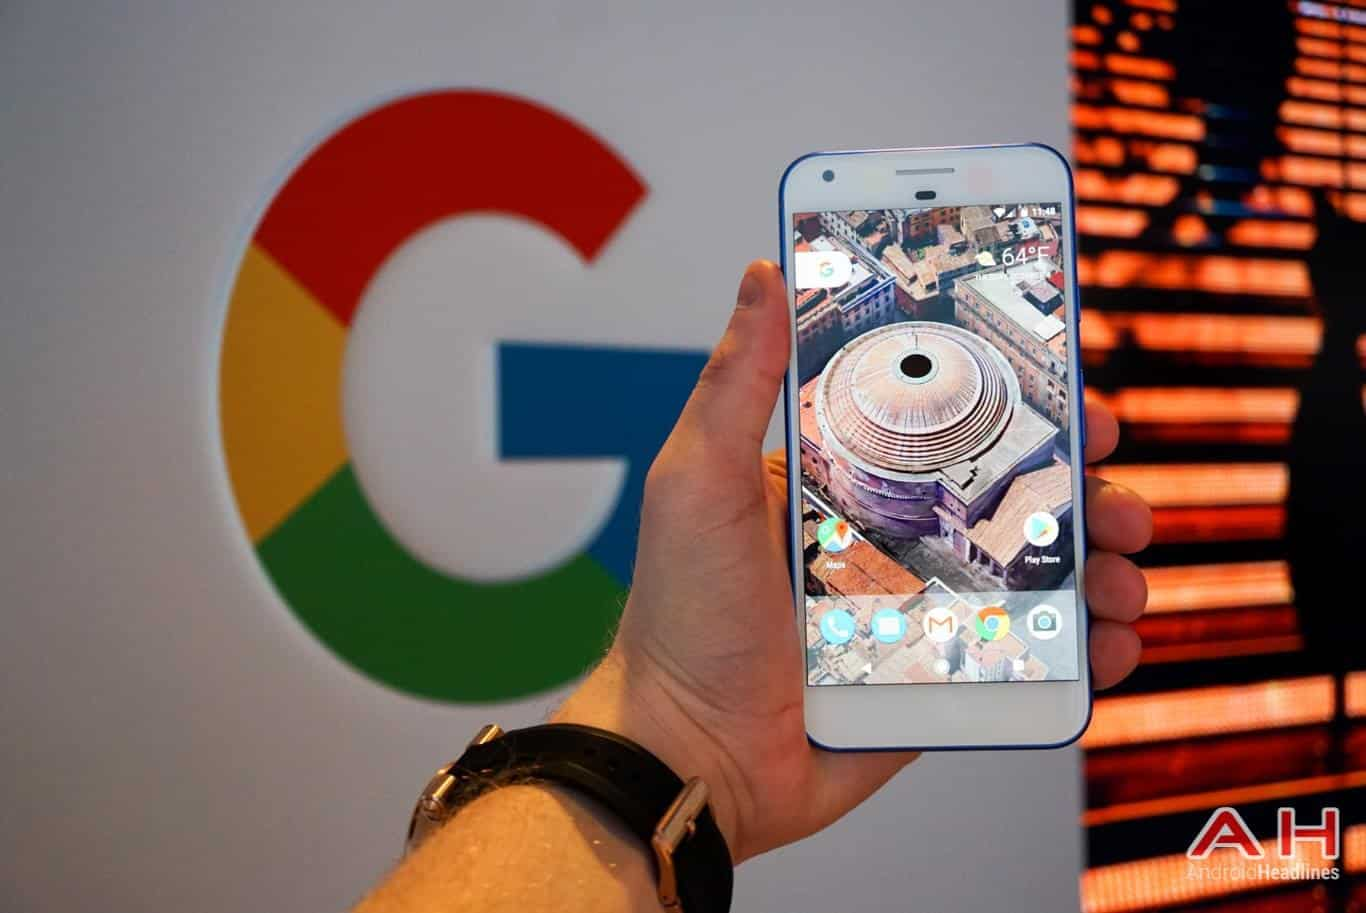 google-pixel-xl-hands-on-ah-4